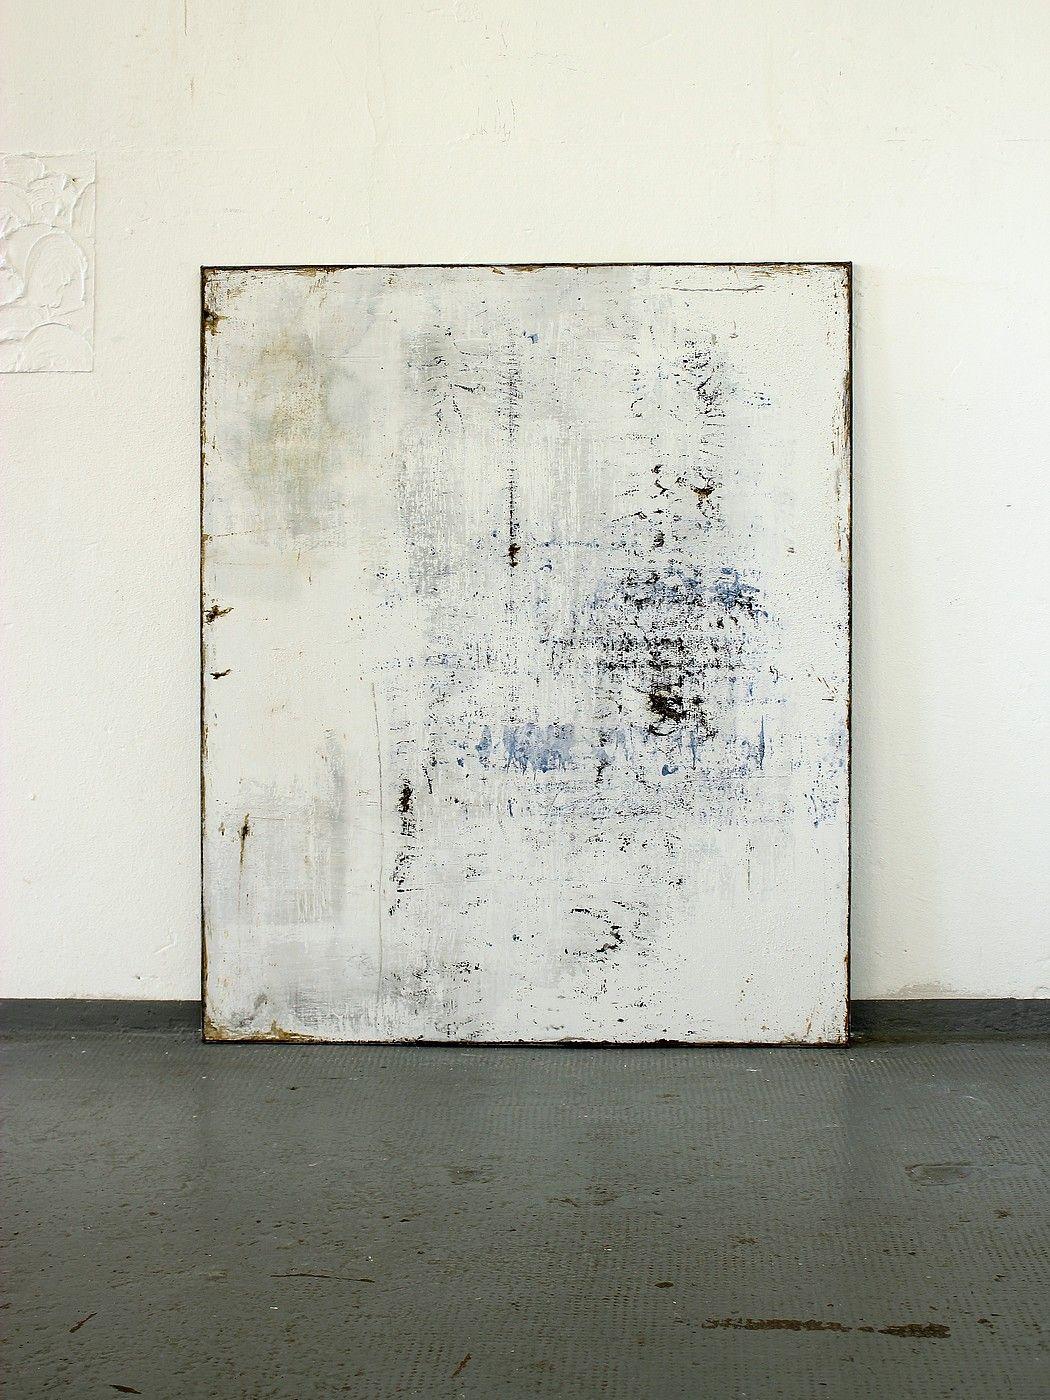 201 5  - 1 2 0  x 1 0 0  cm - Mischtechnik auf  Leinwand ,abstrakte,  Kunst,    malerei, Leinwand, painting, abstract,          contemporar...